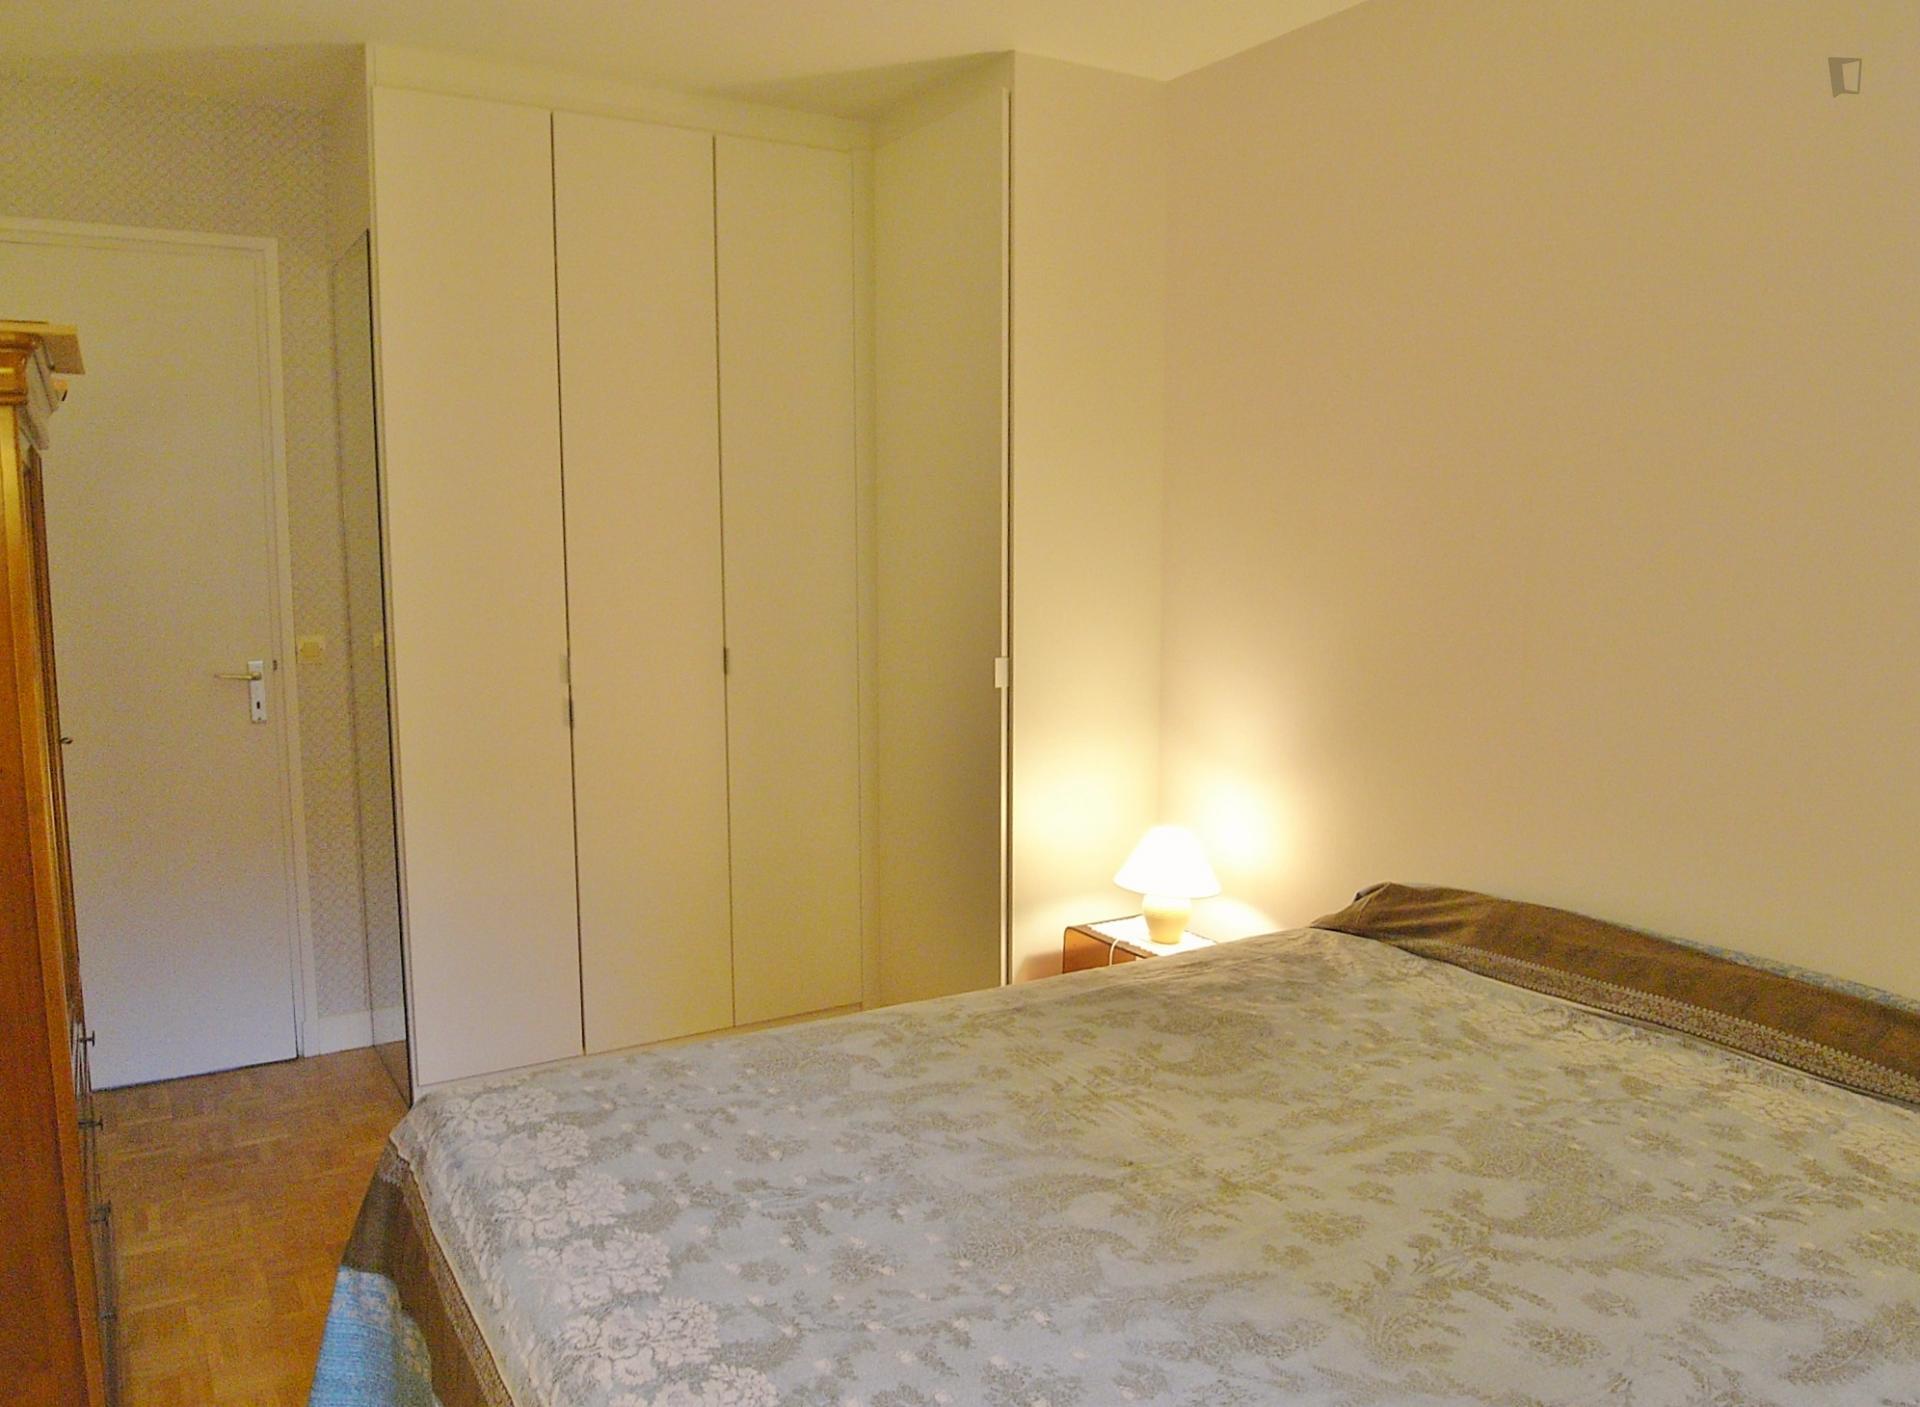 D'Alesia- Nice 1 bedroom flat for expat in Paris